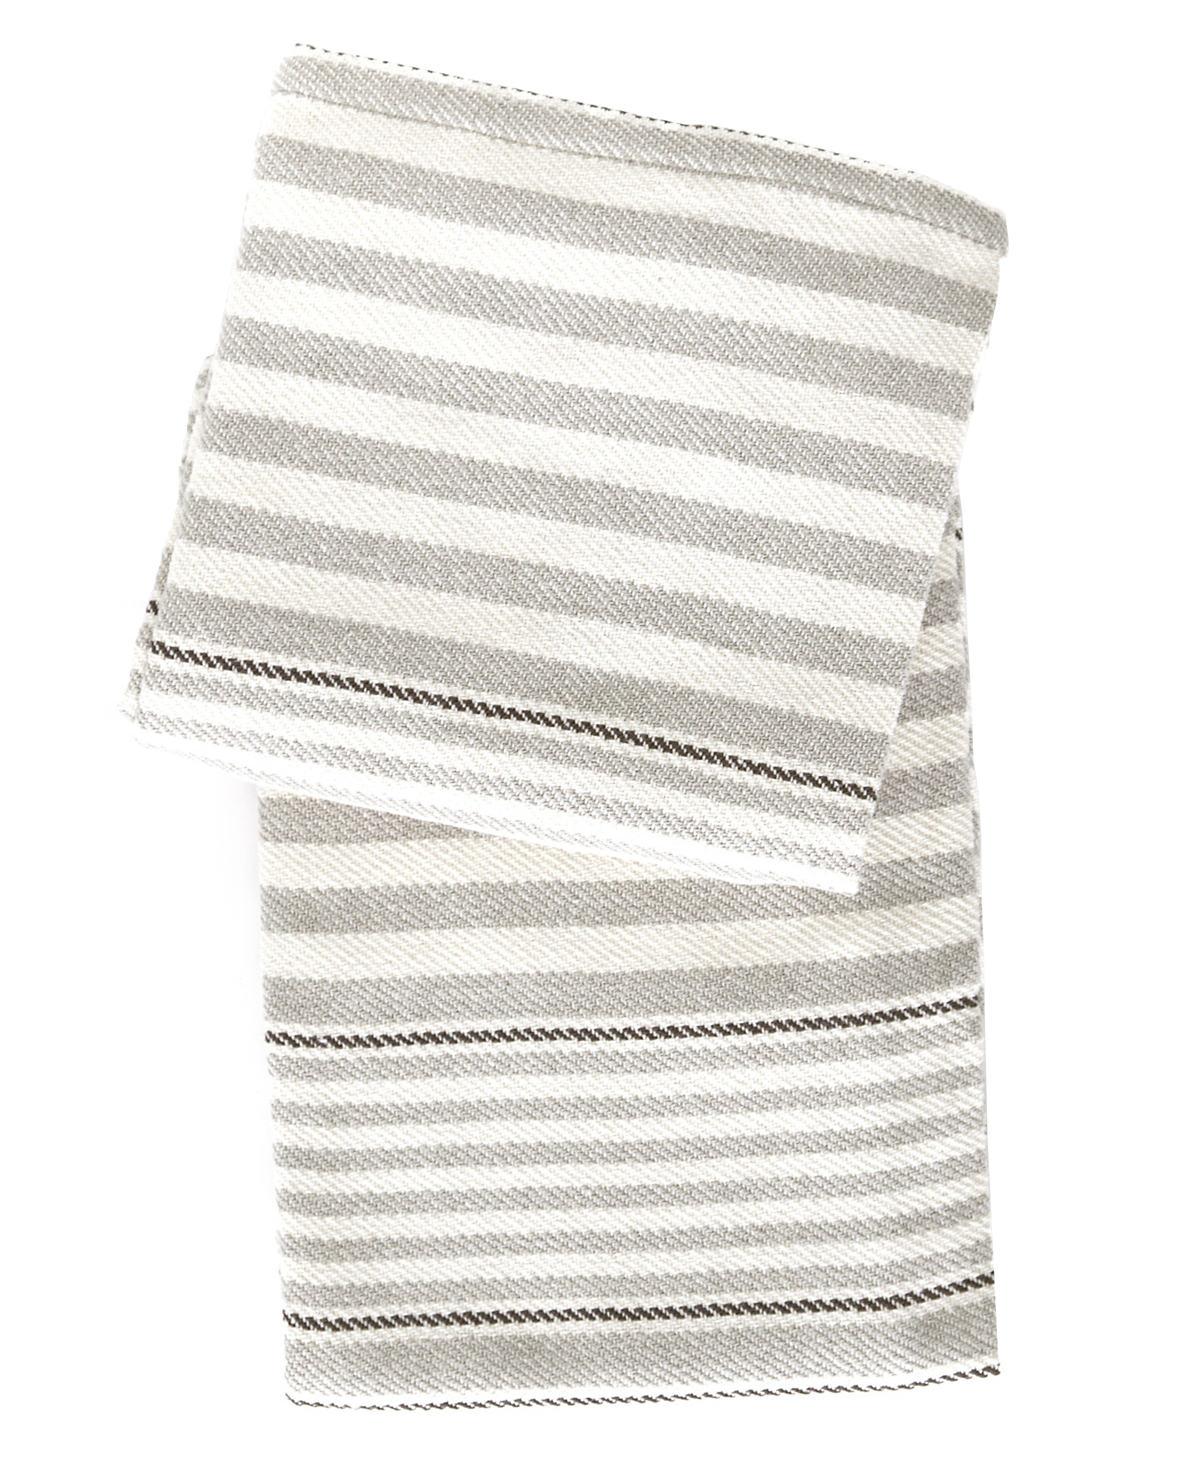 Rugby stripe platinum woven cotton throw dash albert for Dash and albert blanket